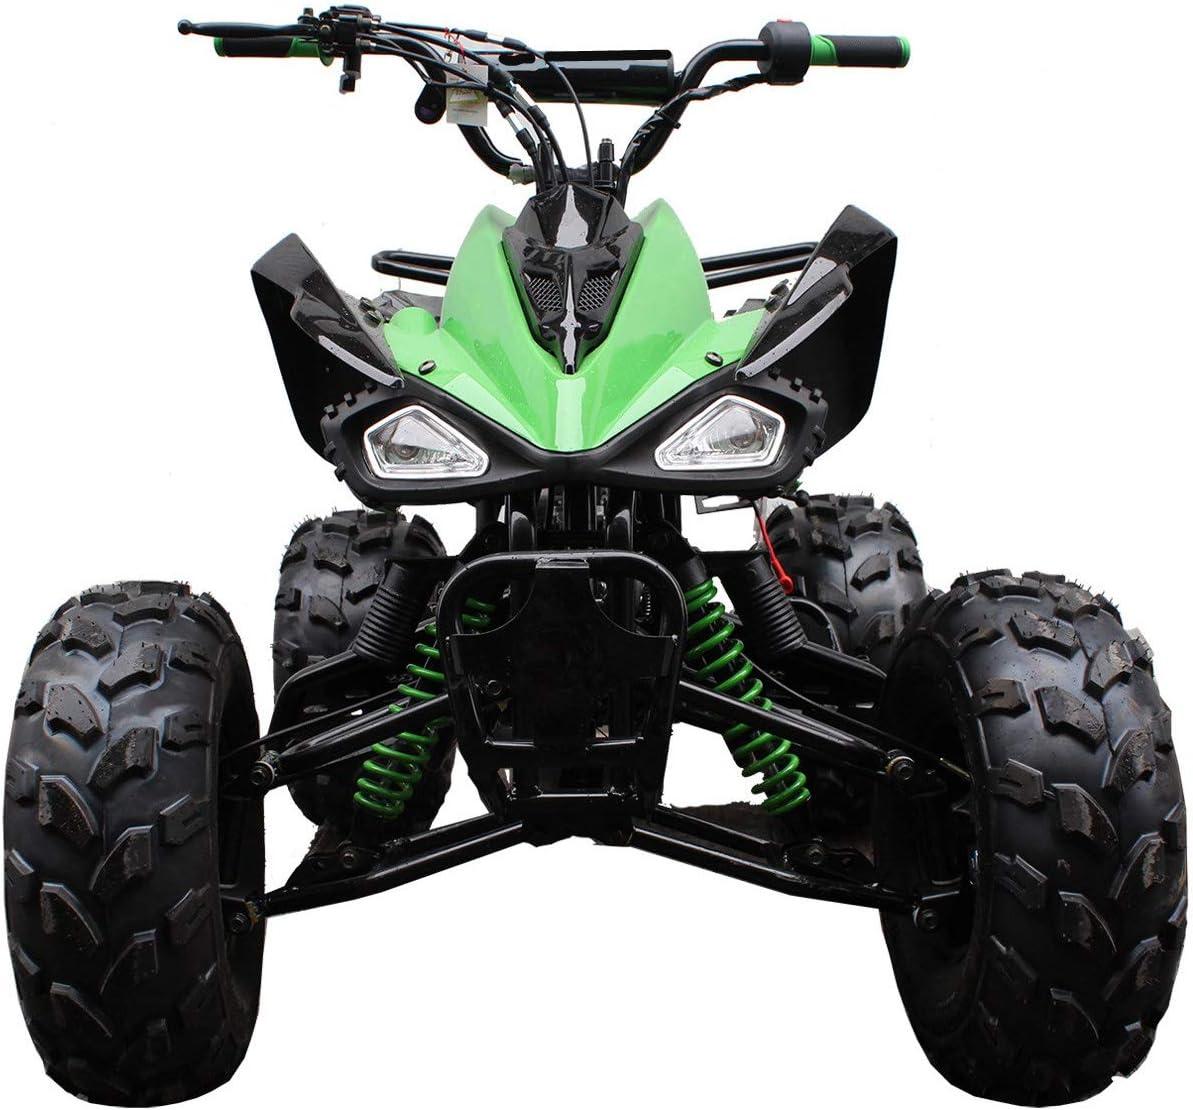 Blue X-PRO 125cc ATV Kids ATV Youth ATV Quad 4 Wheelers Semi-Automatic with Reverse